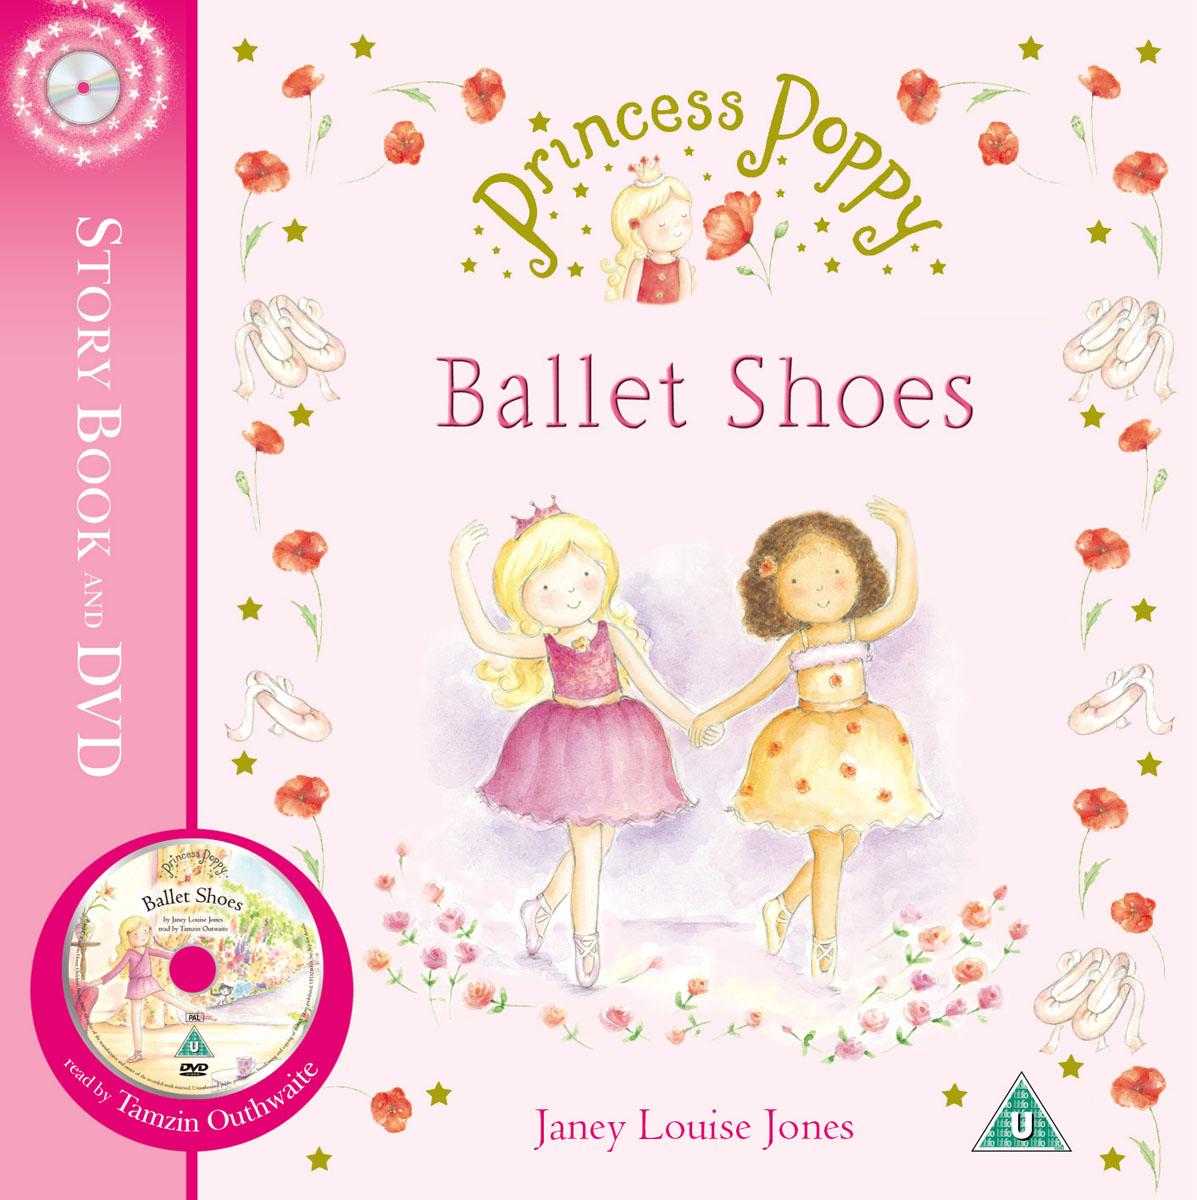 Princess Poppy: Ballet Shoes coppelia